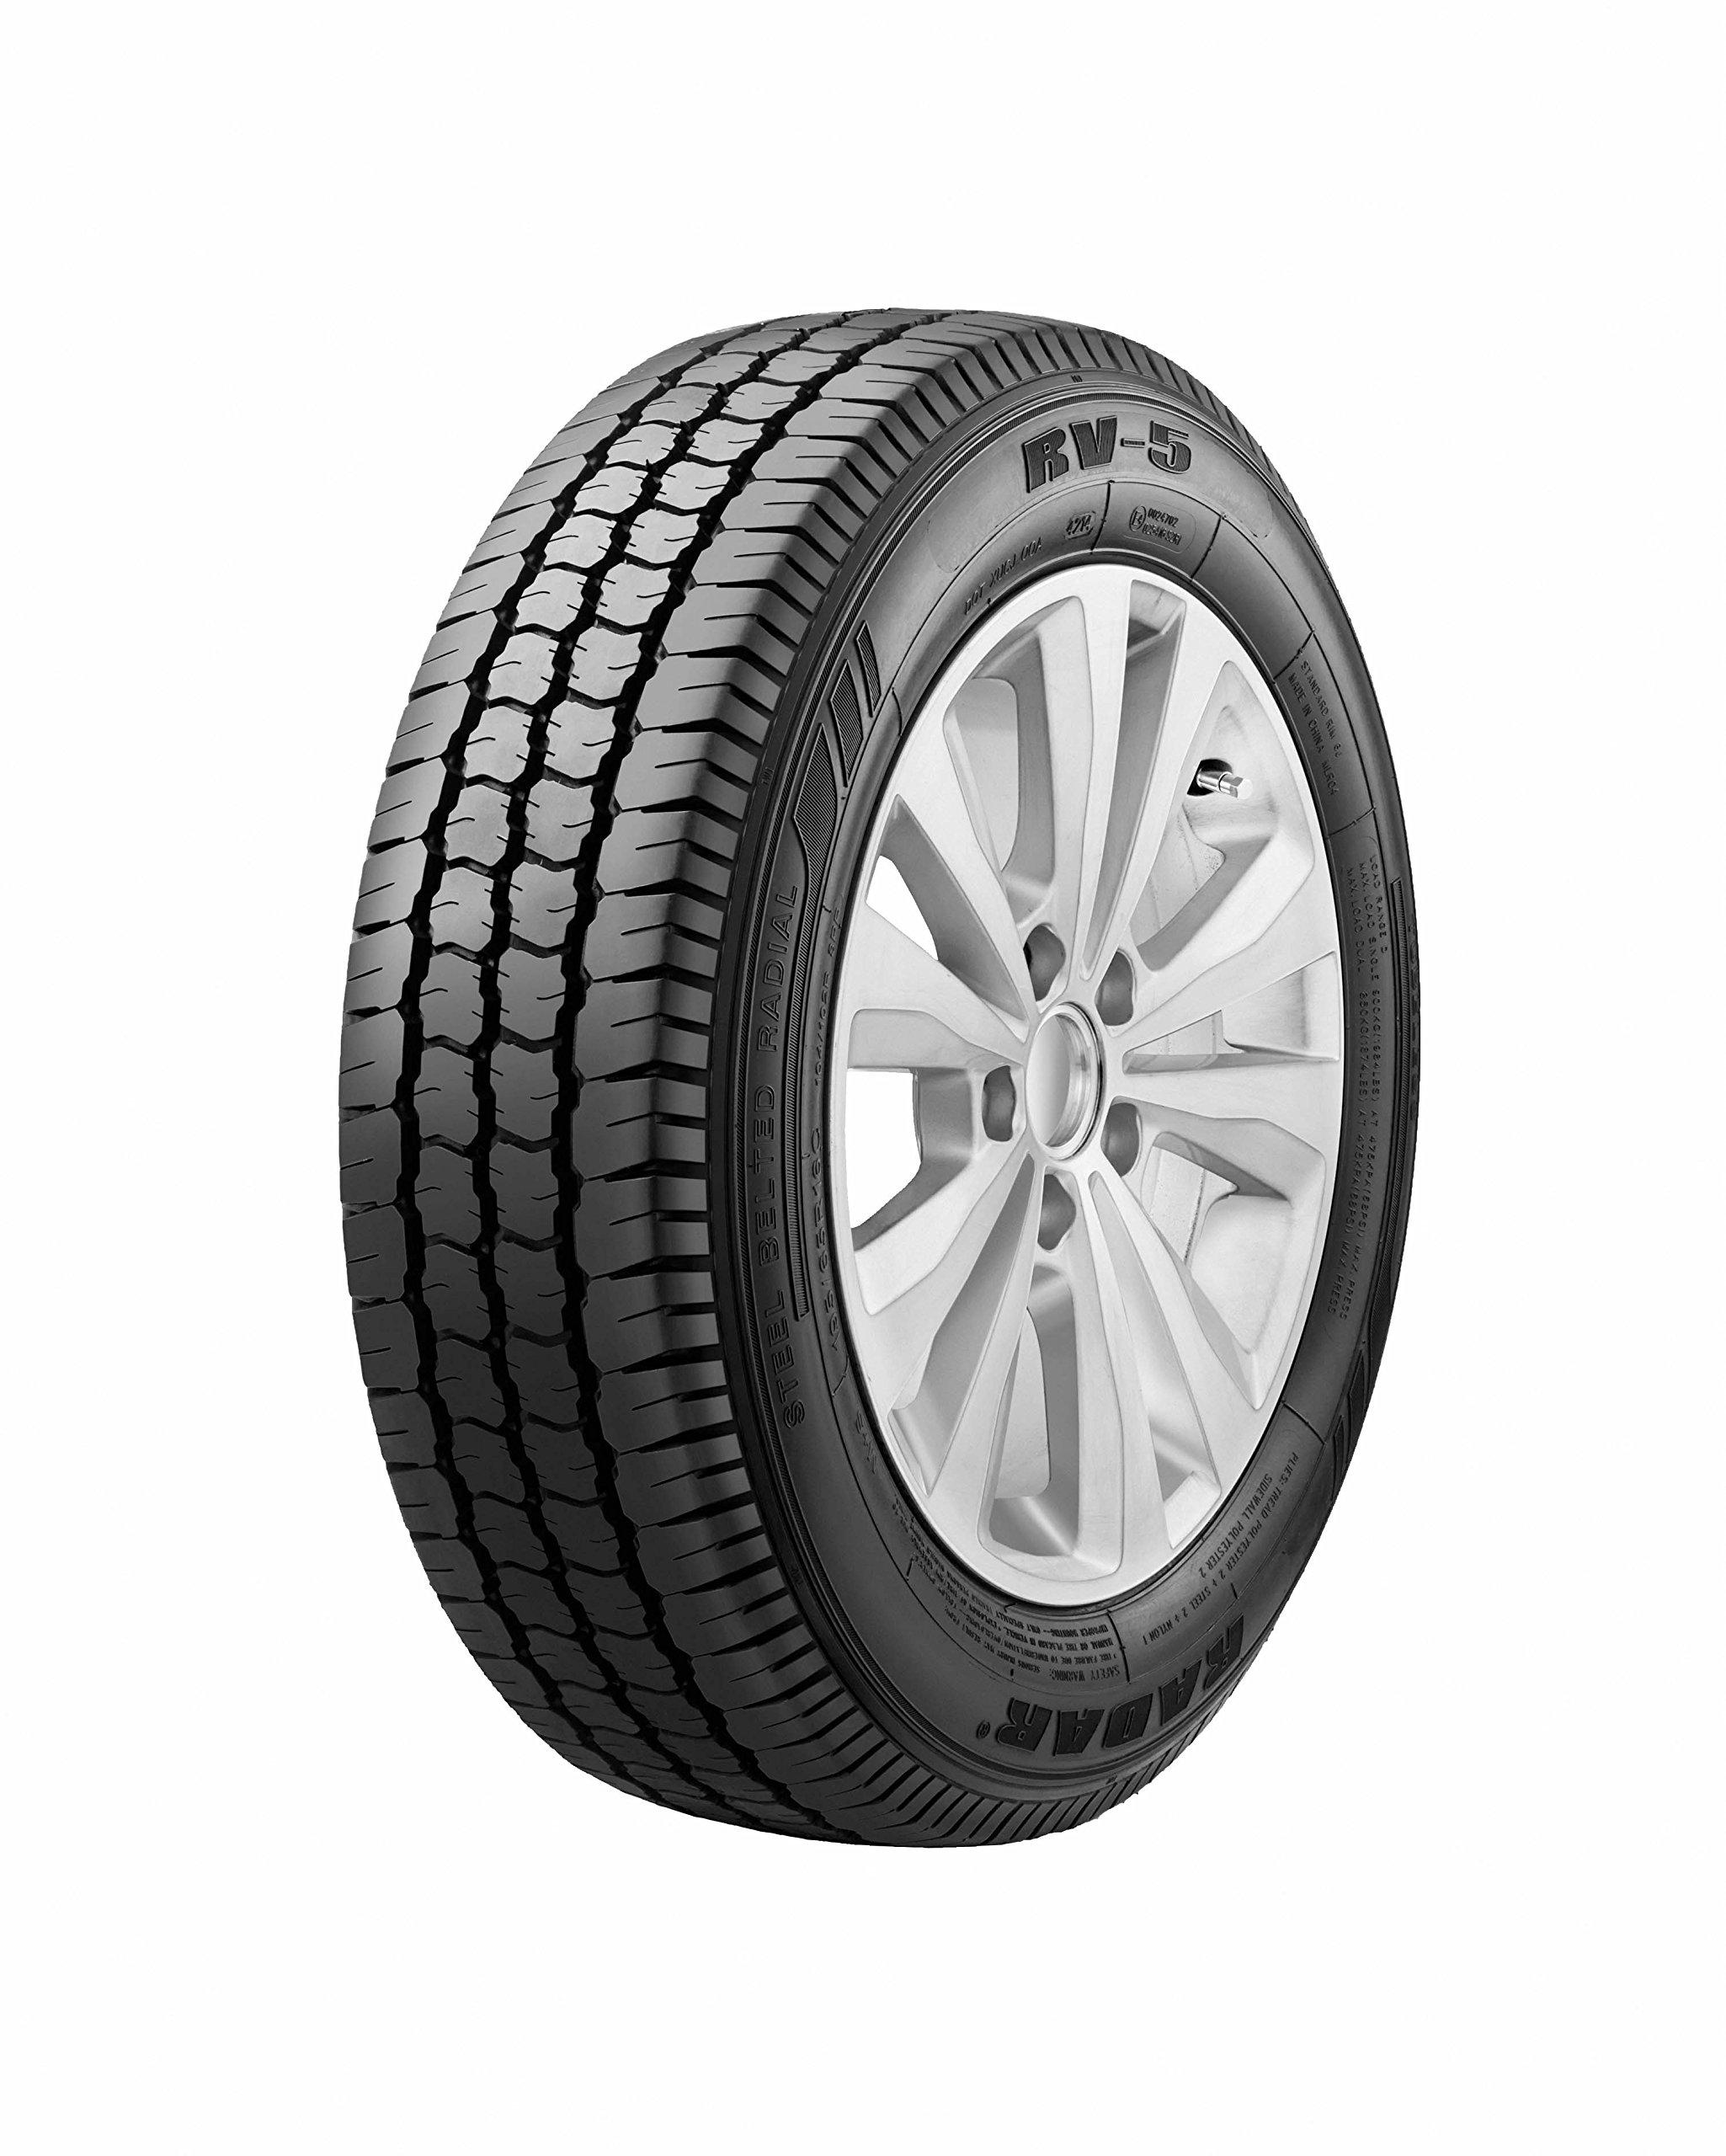 Radar Tires RV-5 Commercial Truck Tire - 195/75R16C 107R